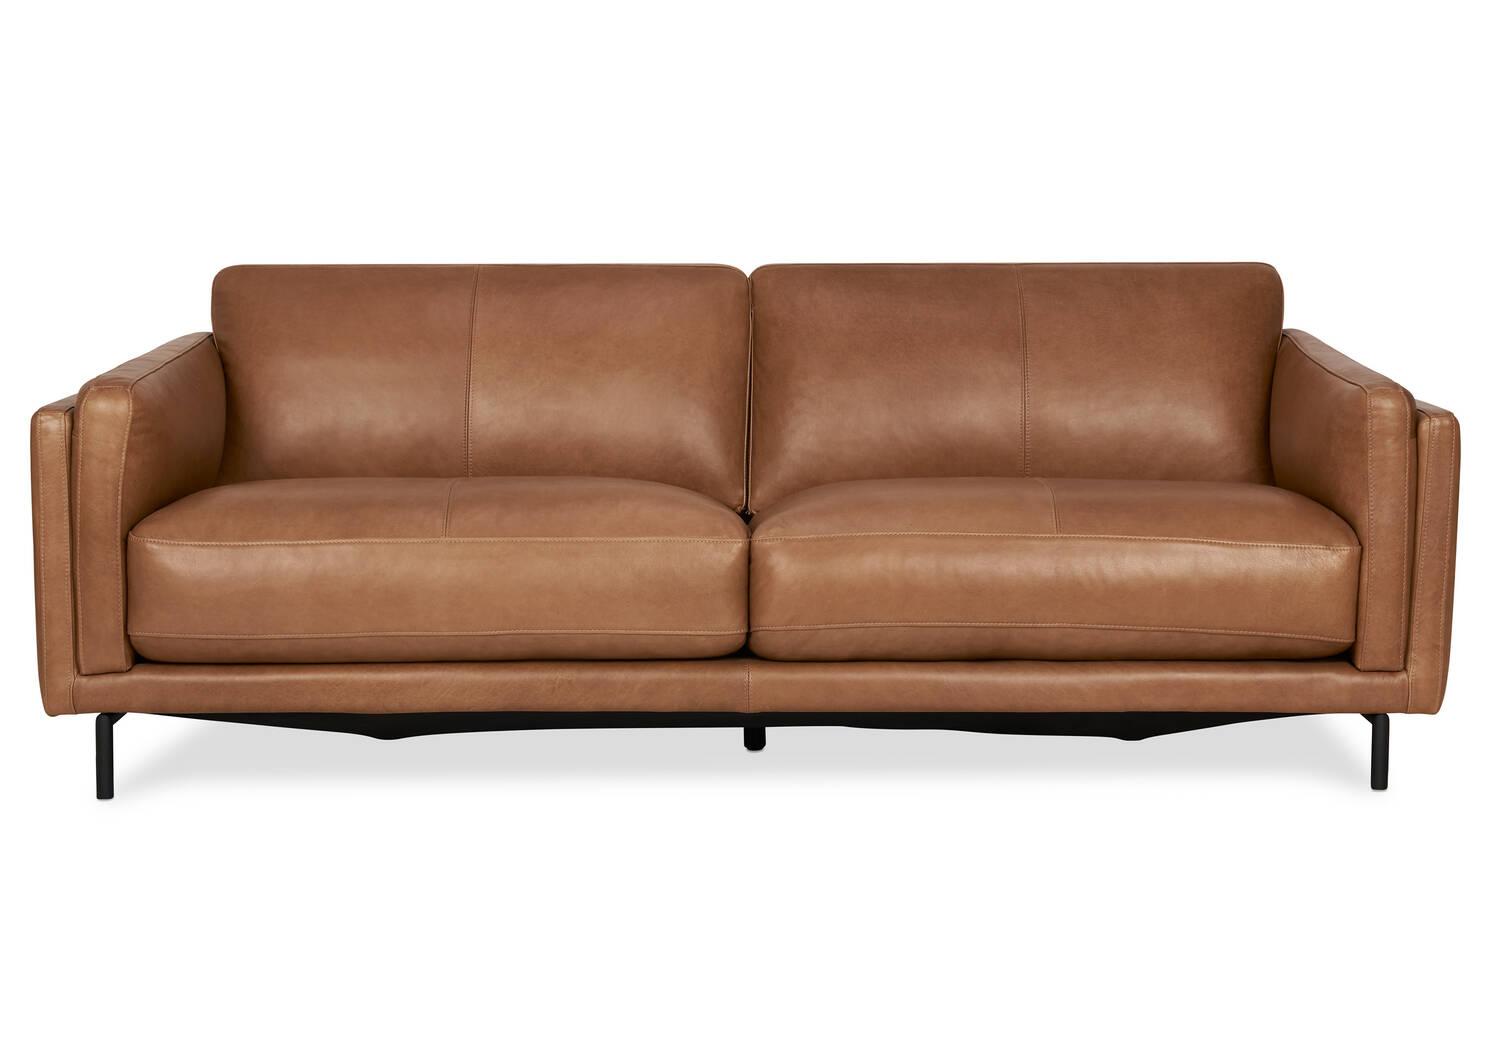 "Renfrew Leather Sofa 80"" -Adler Tan"